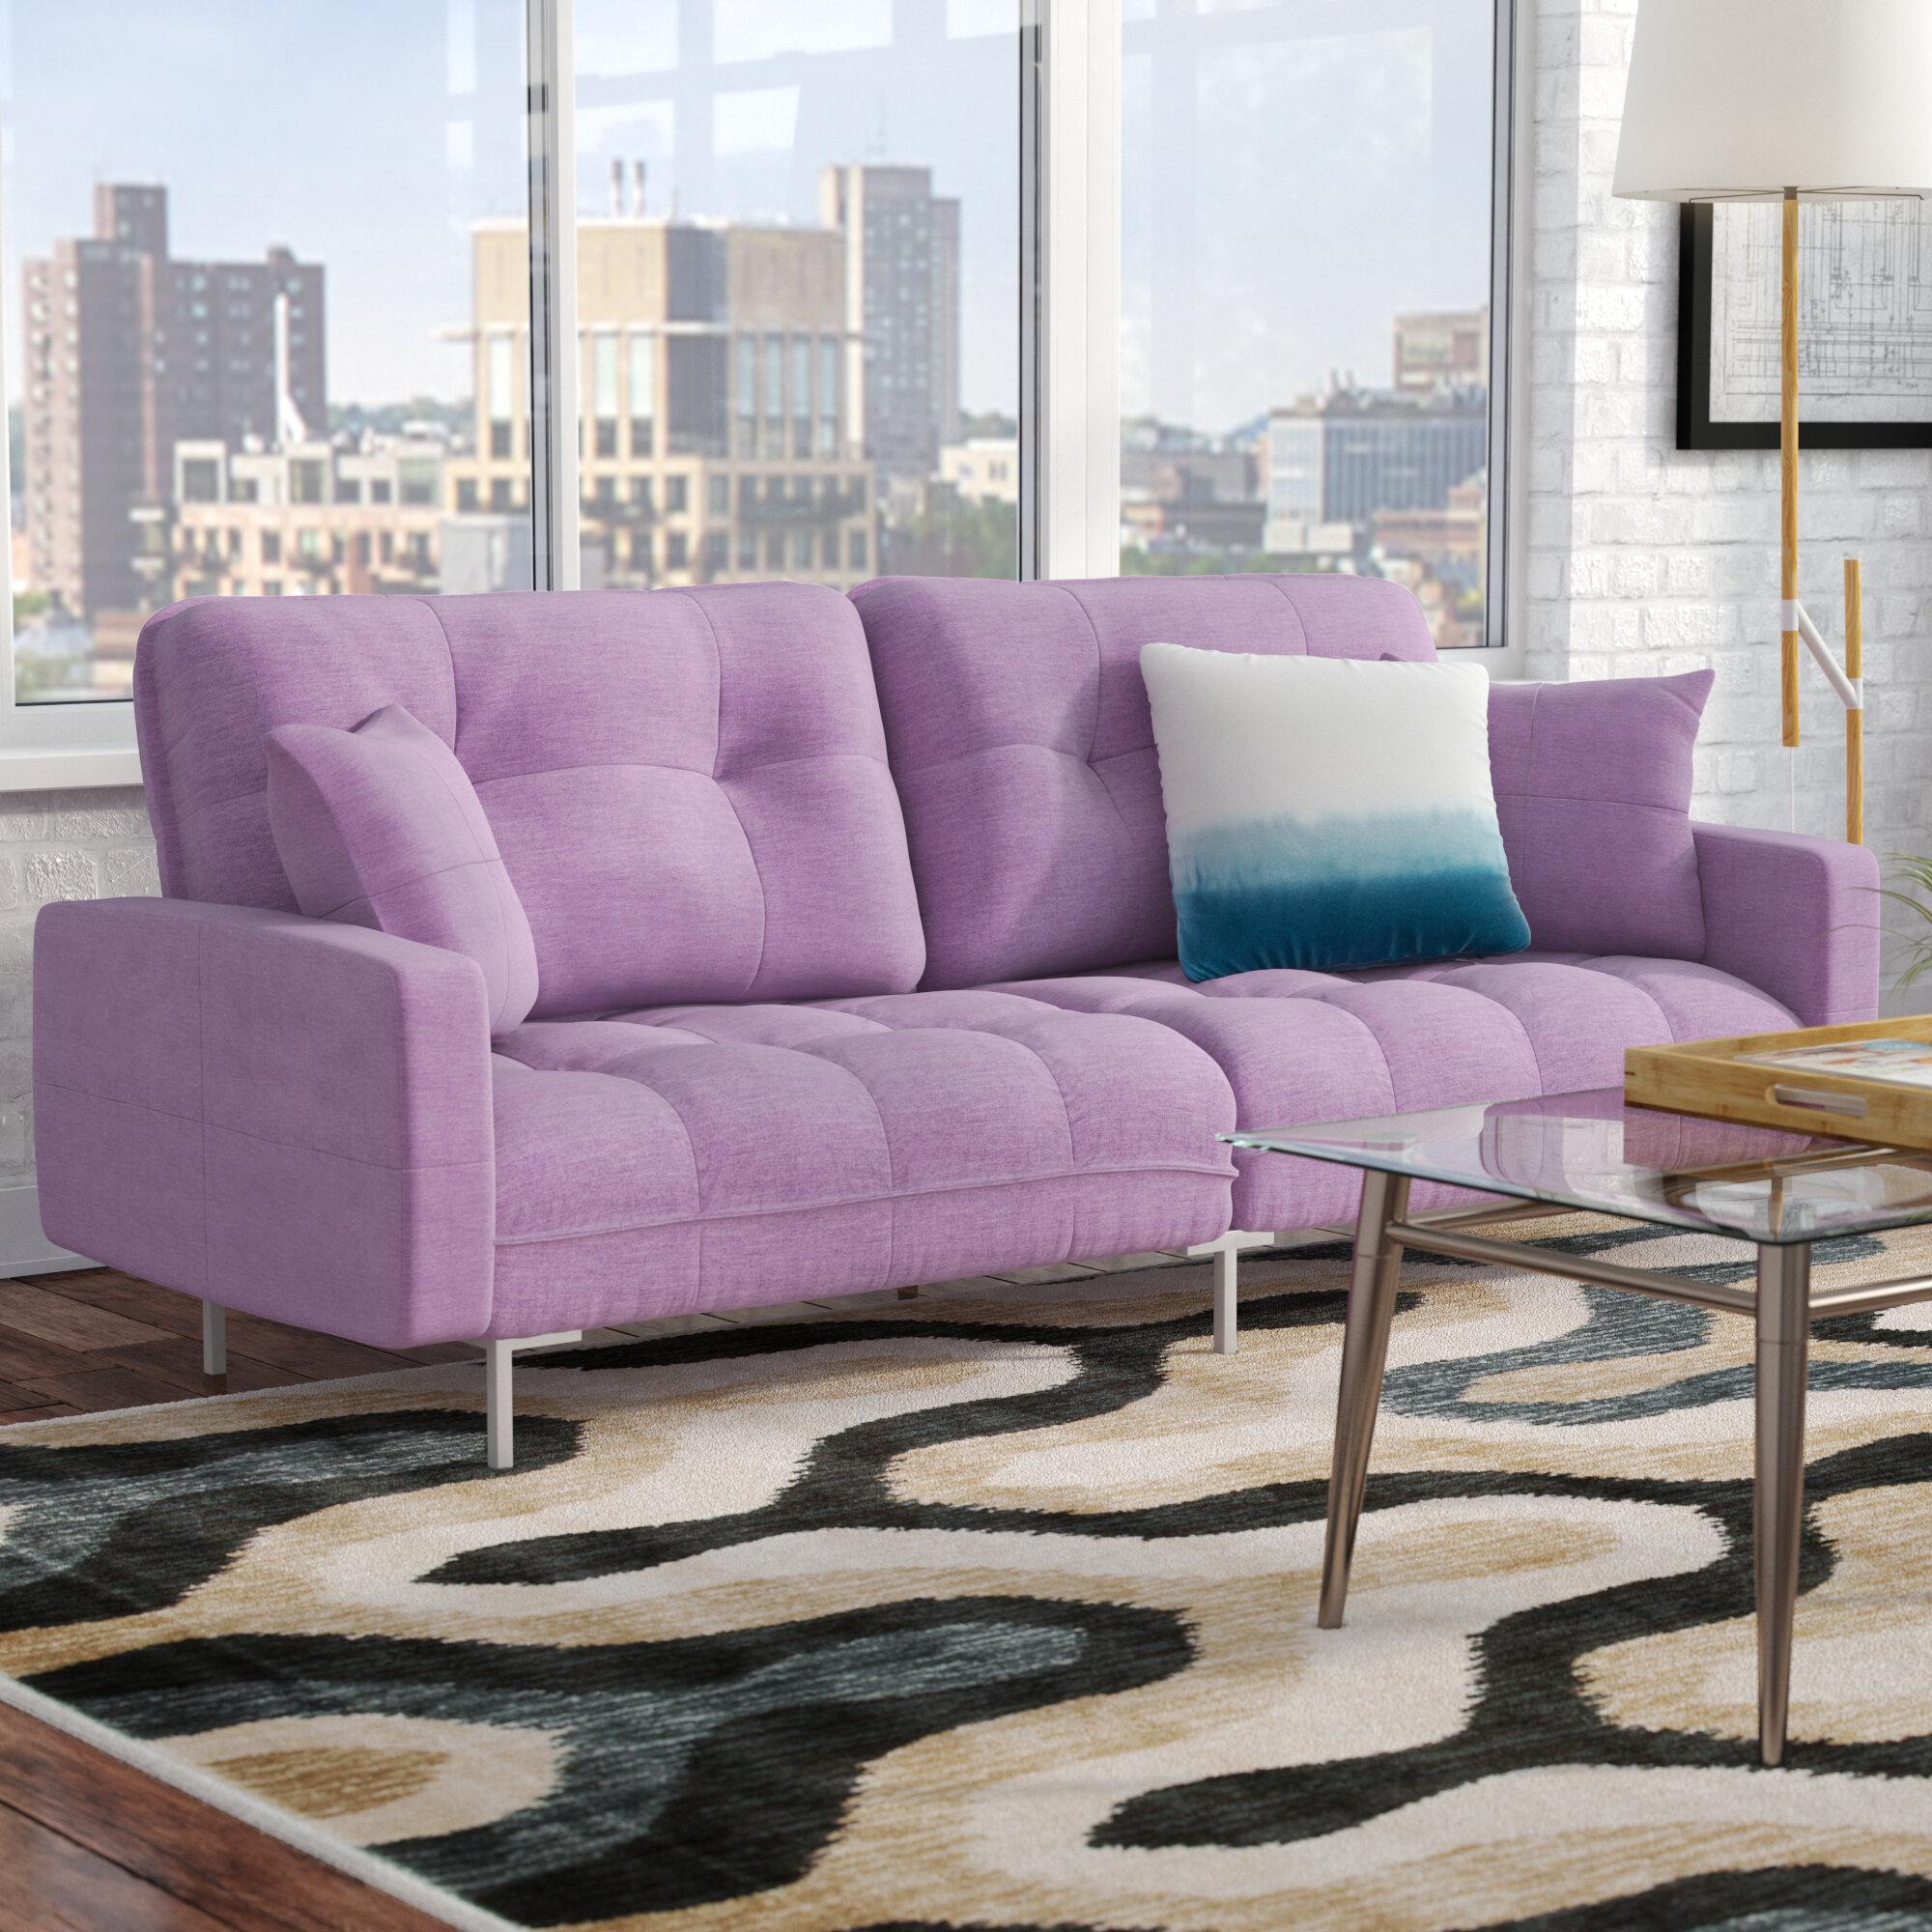 Zipcode Design Frederick Modern Plush Tufted Convertible Sofa Reviews Wayfair